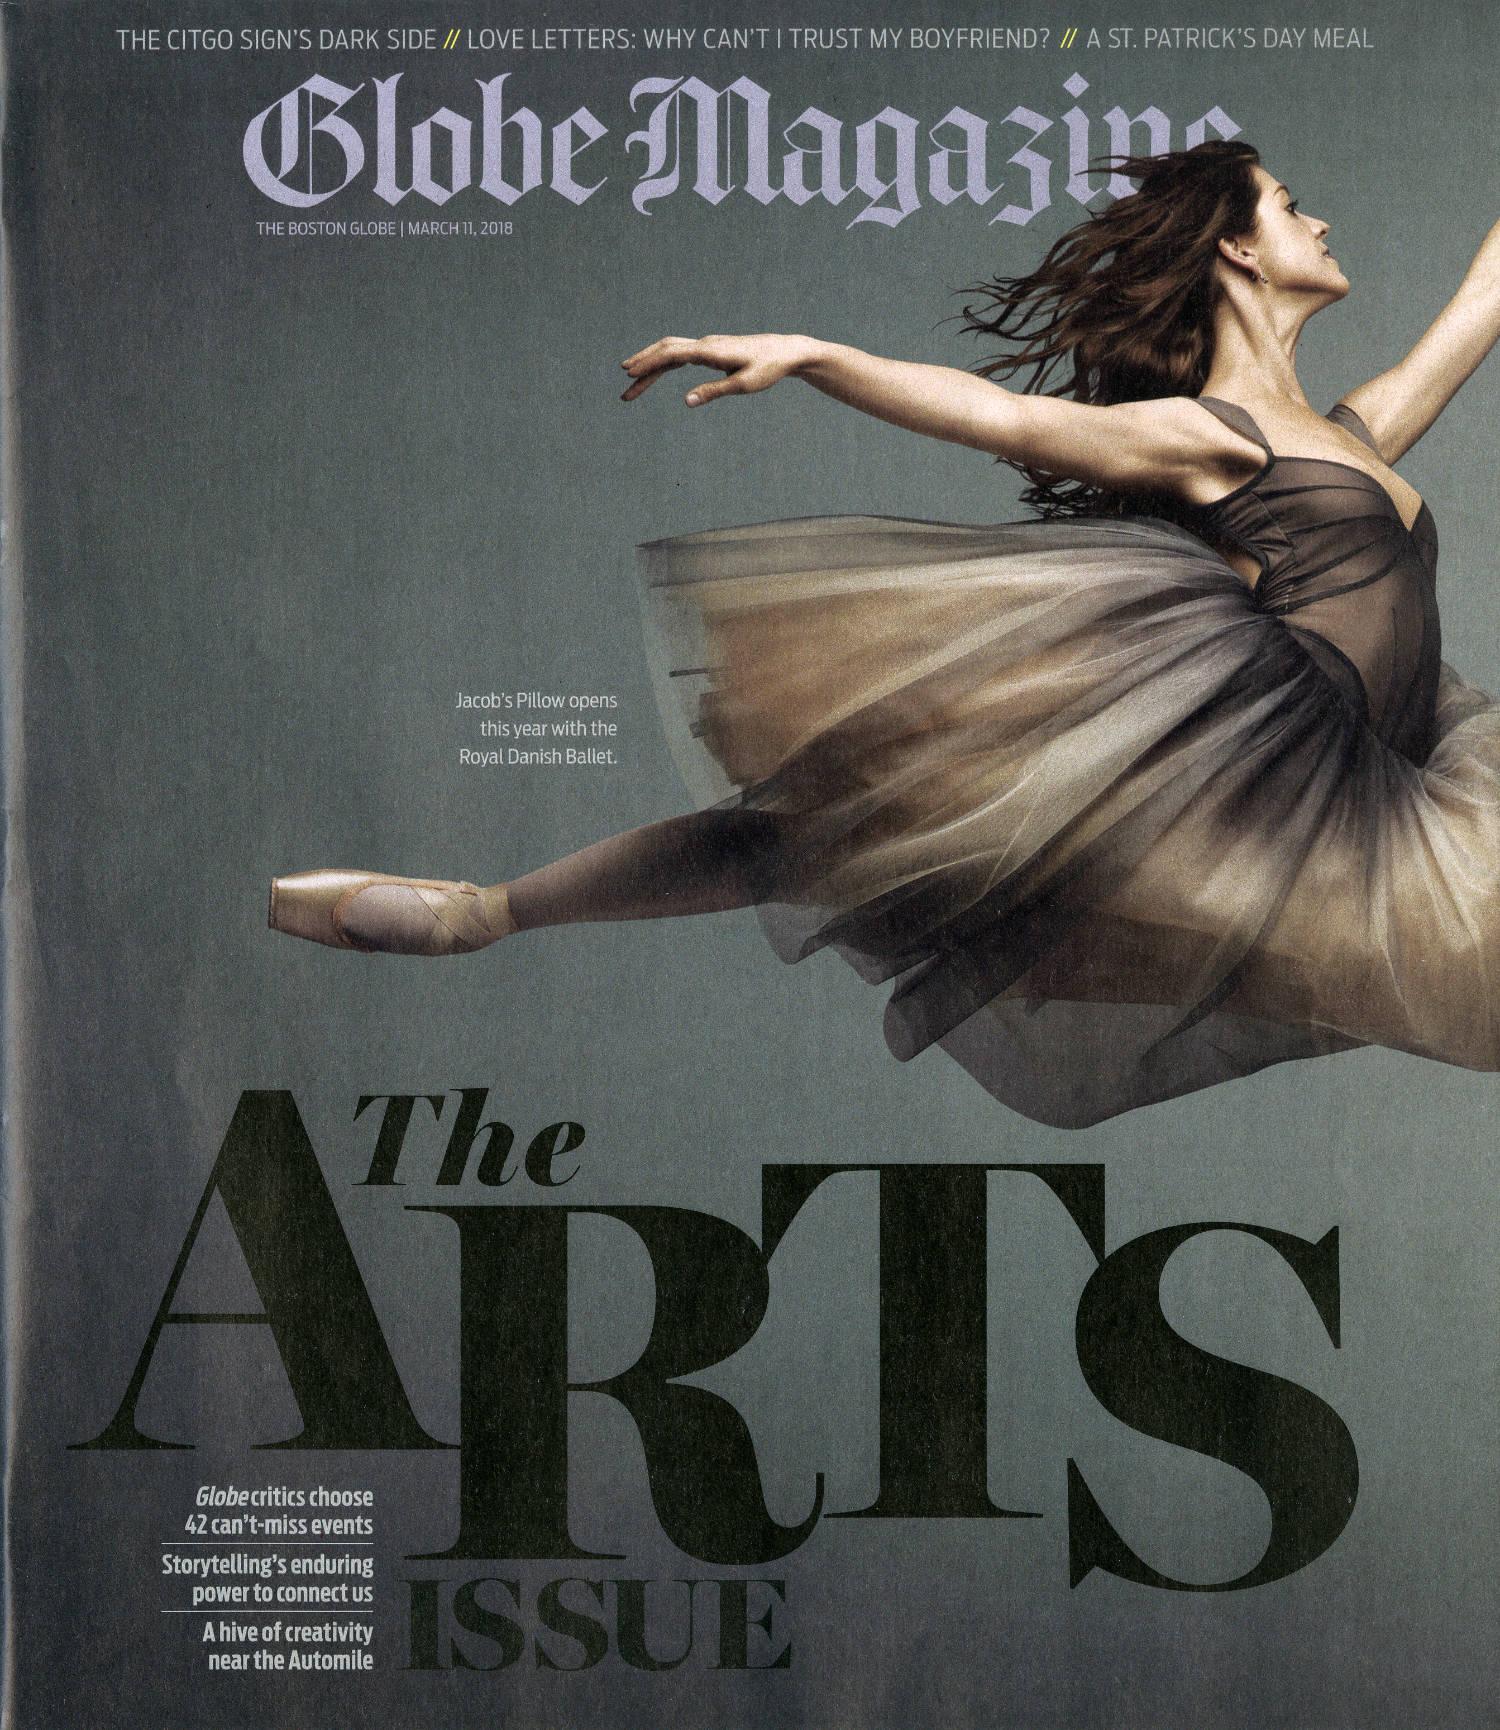 Cover photo: Klaus Vedfelt, art direction: Greg Klee